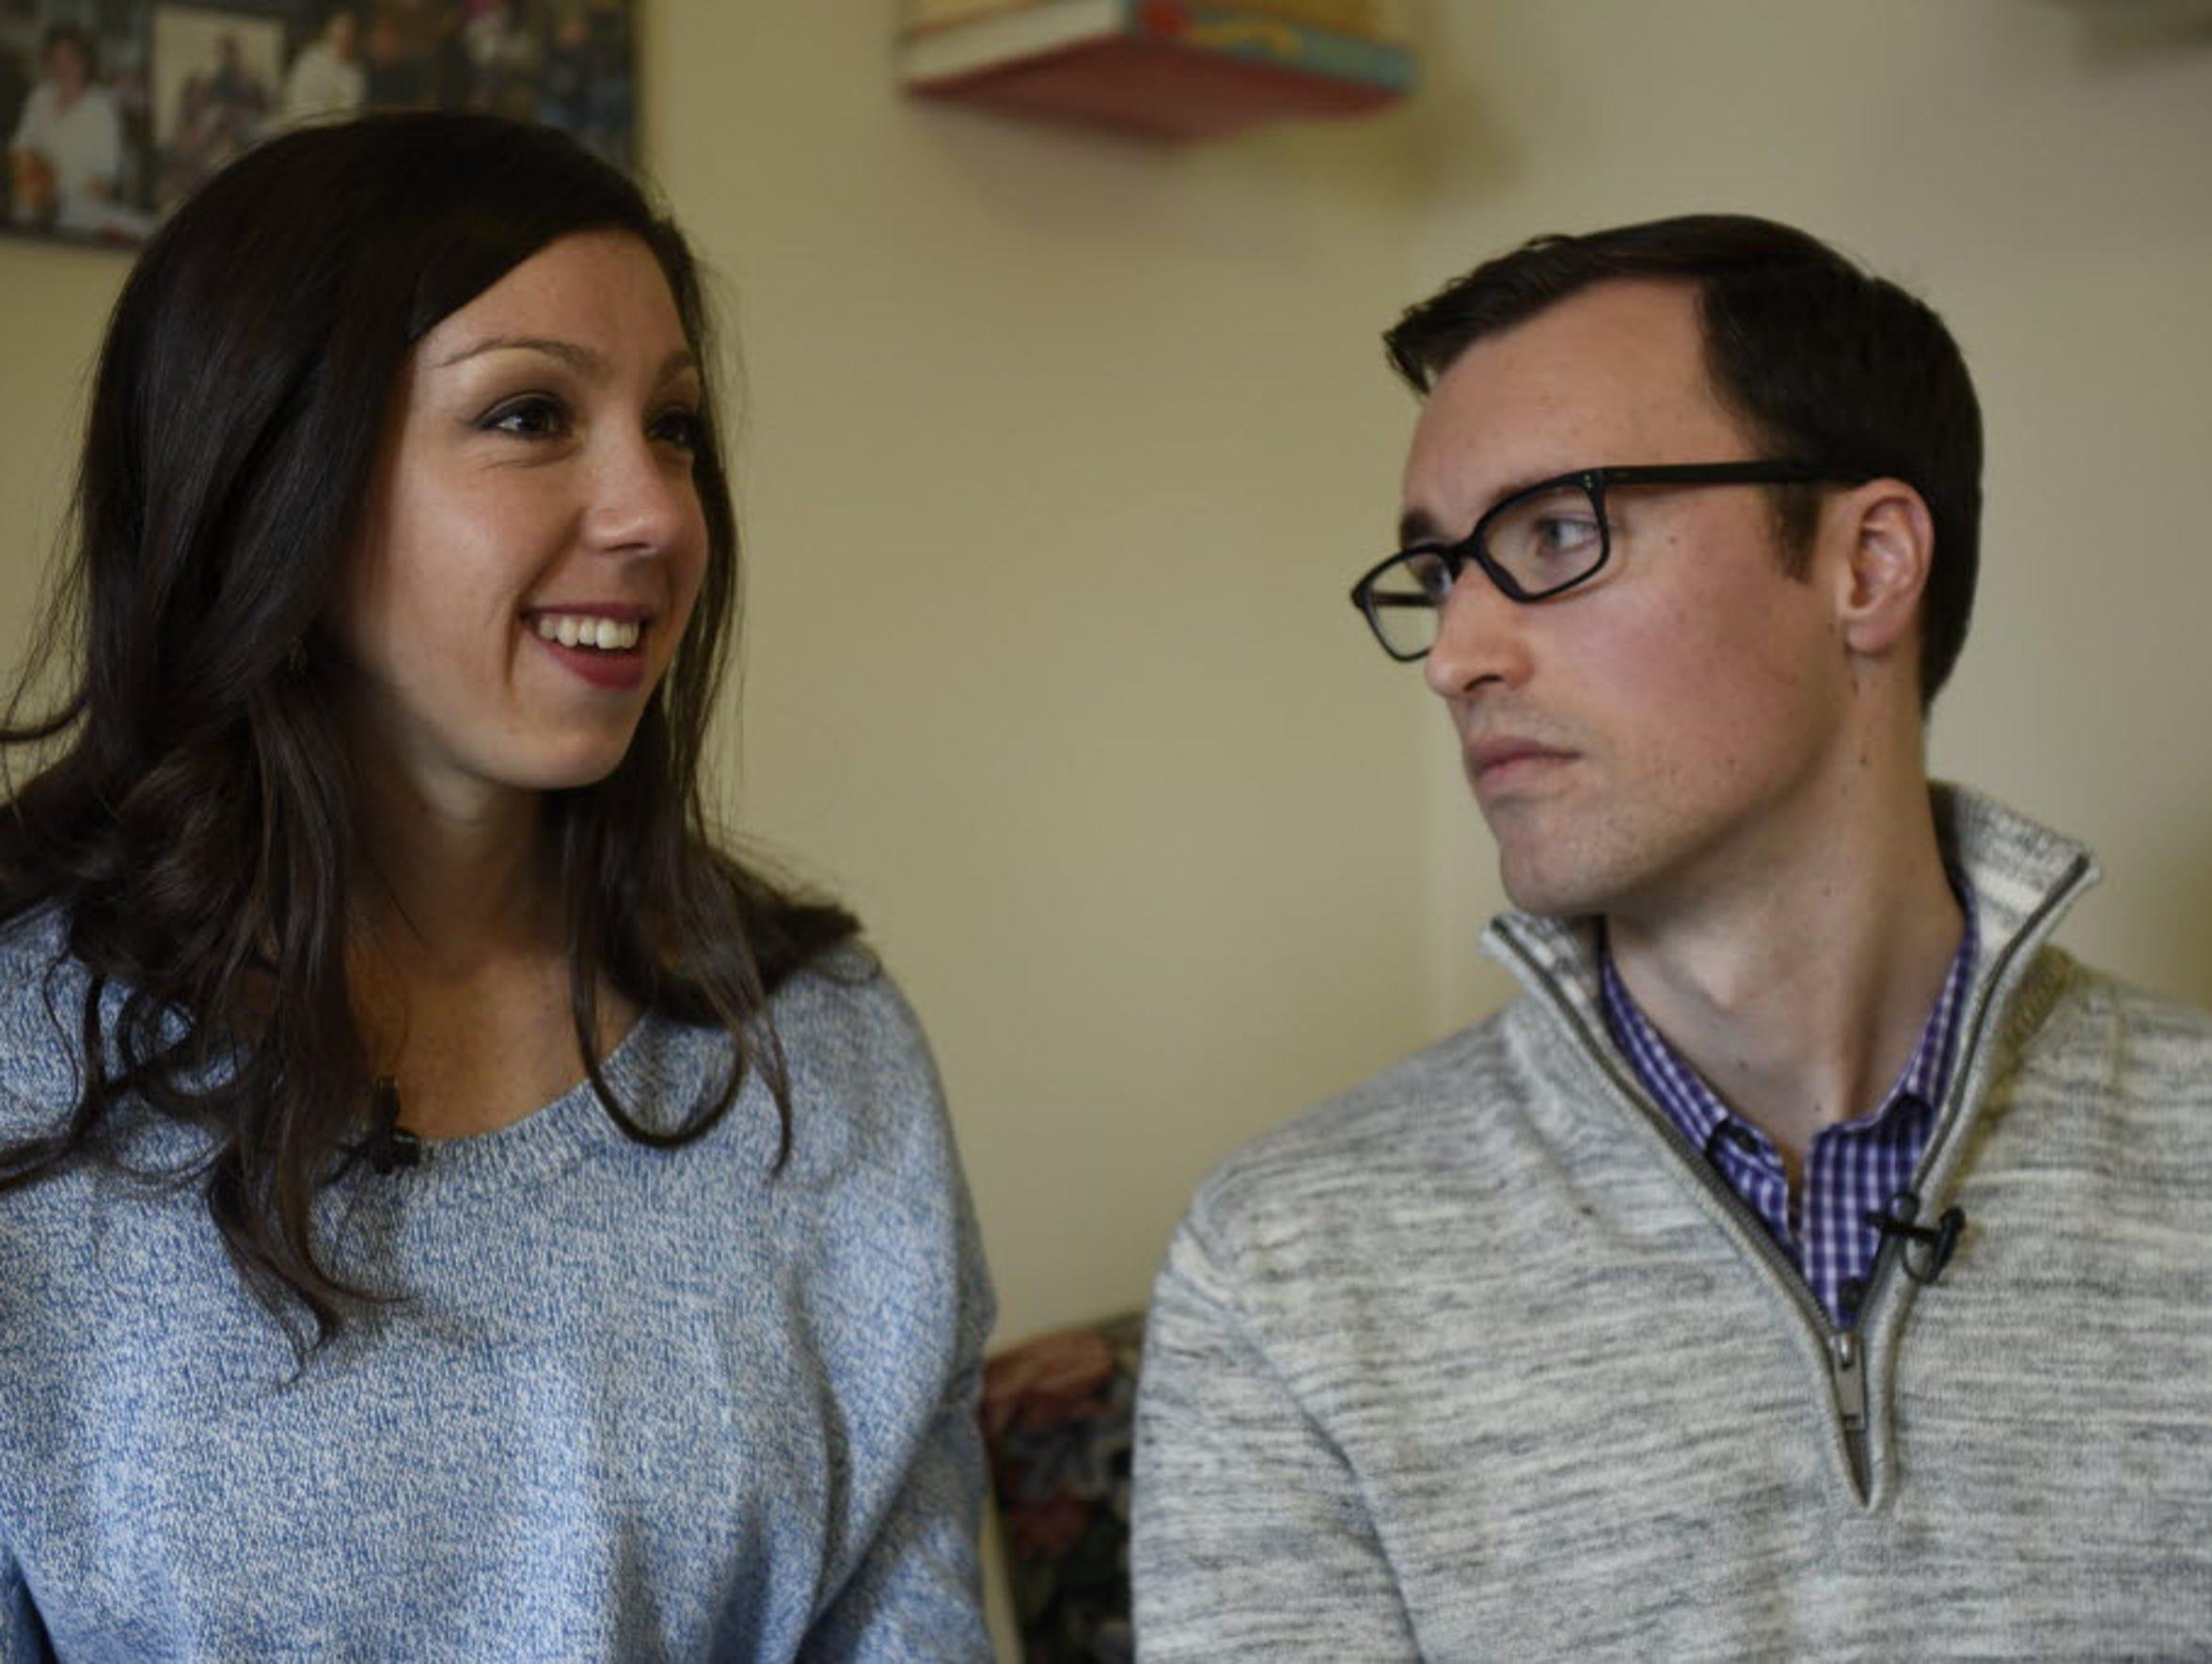 Elizabeth and David Glidden, both 26, talk about the